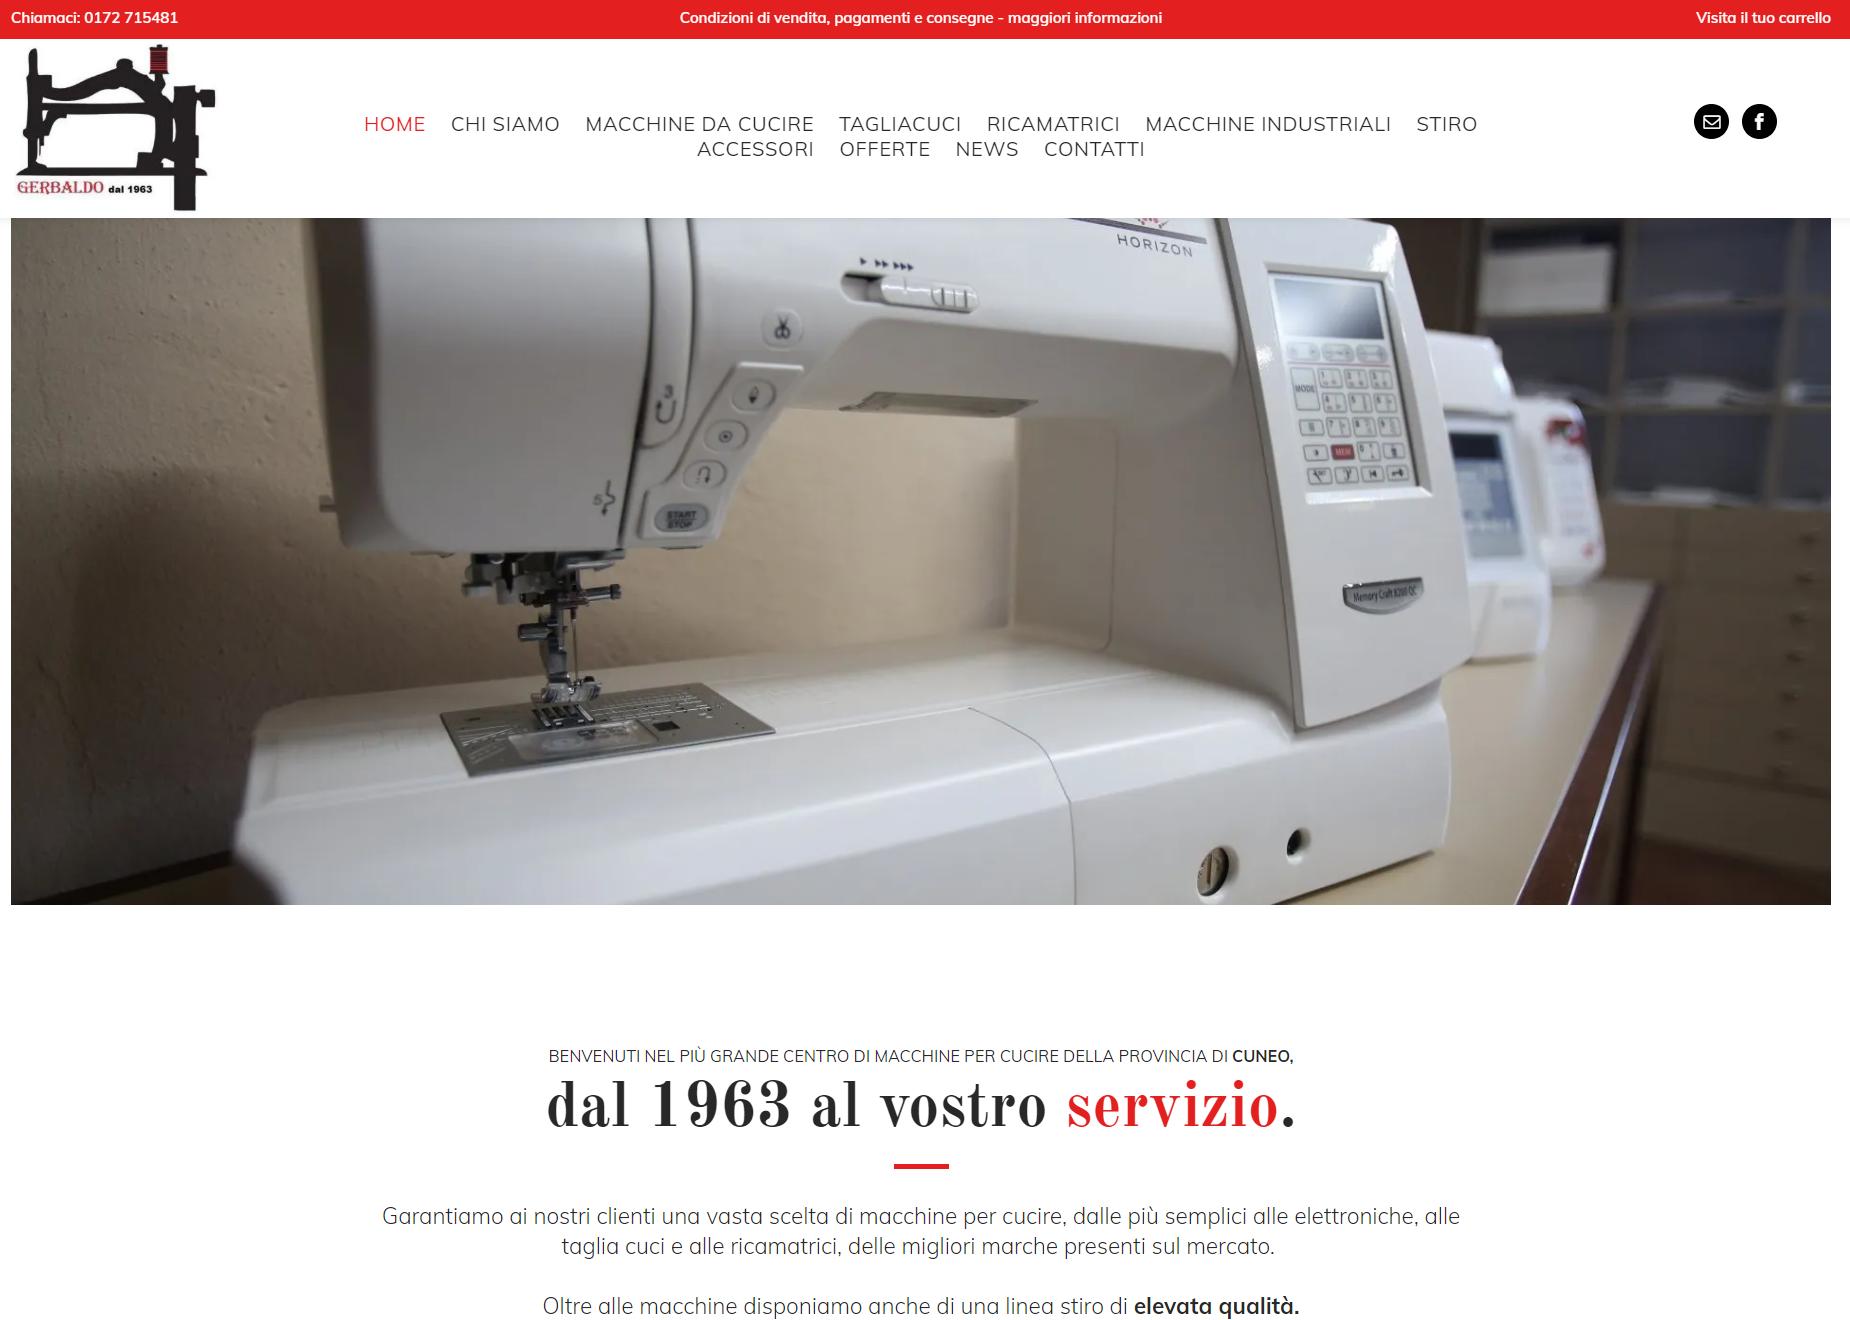 screencapture-gerbaldo-it-2020-05-27-11_57_22 (1)